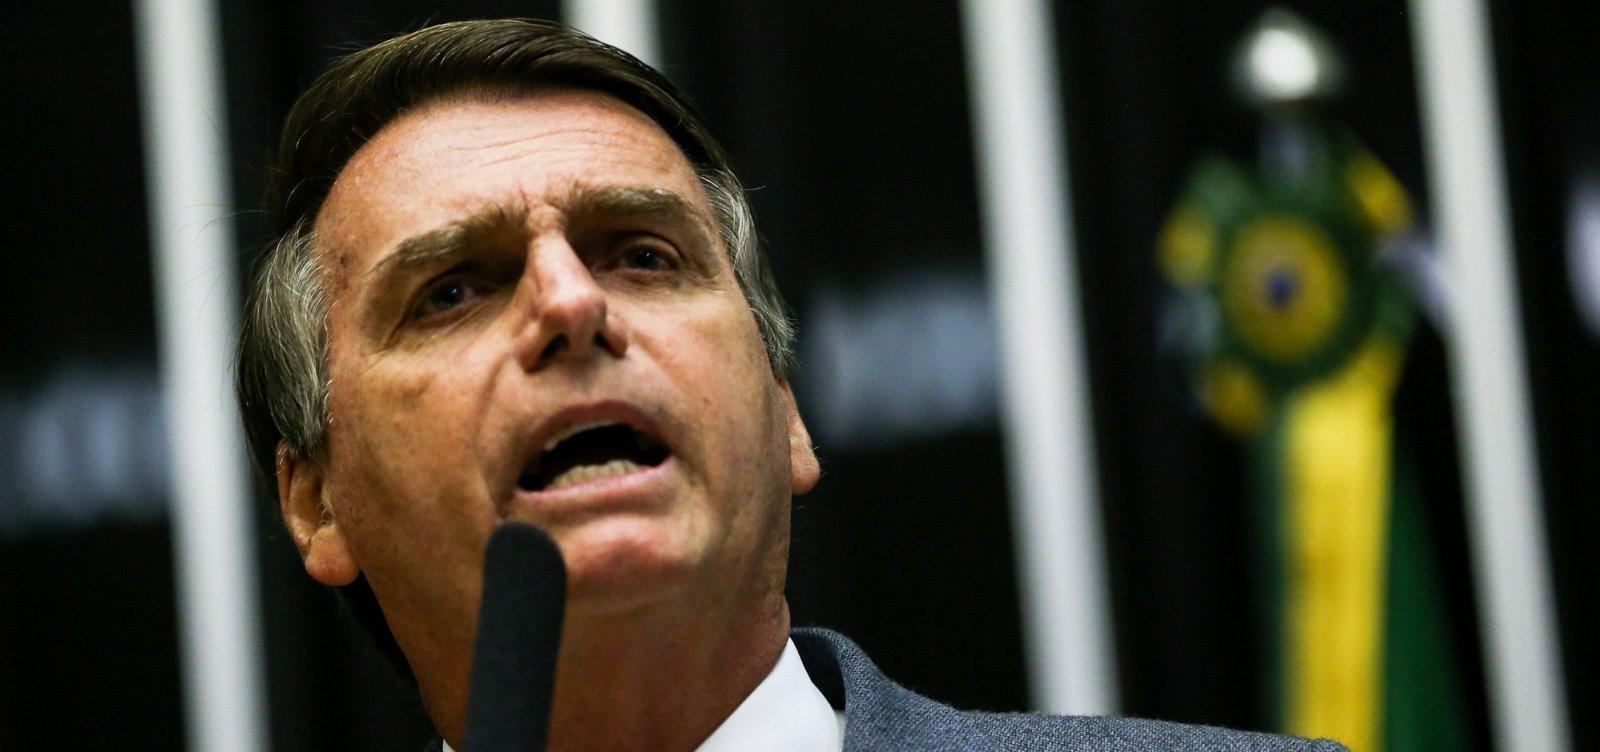 Bolsonaro desiste de debate, mas convoca ato político no Rio de Janeiro